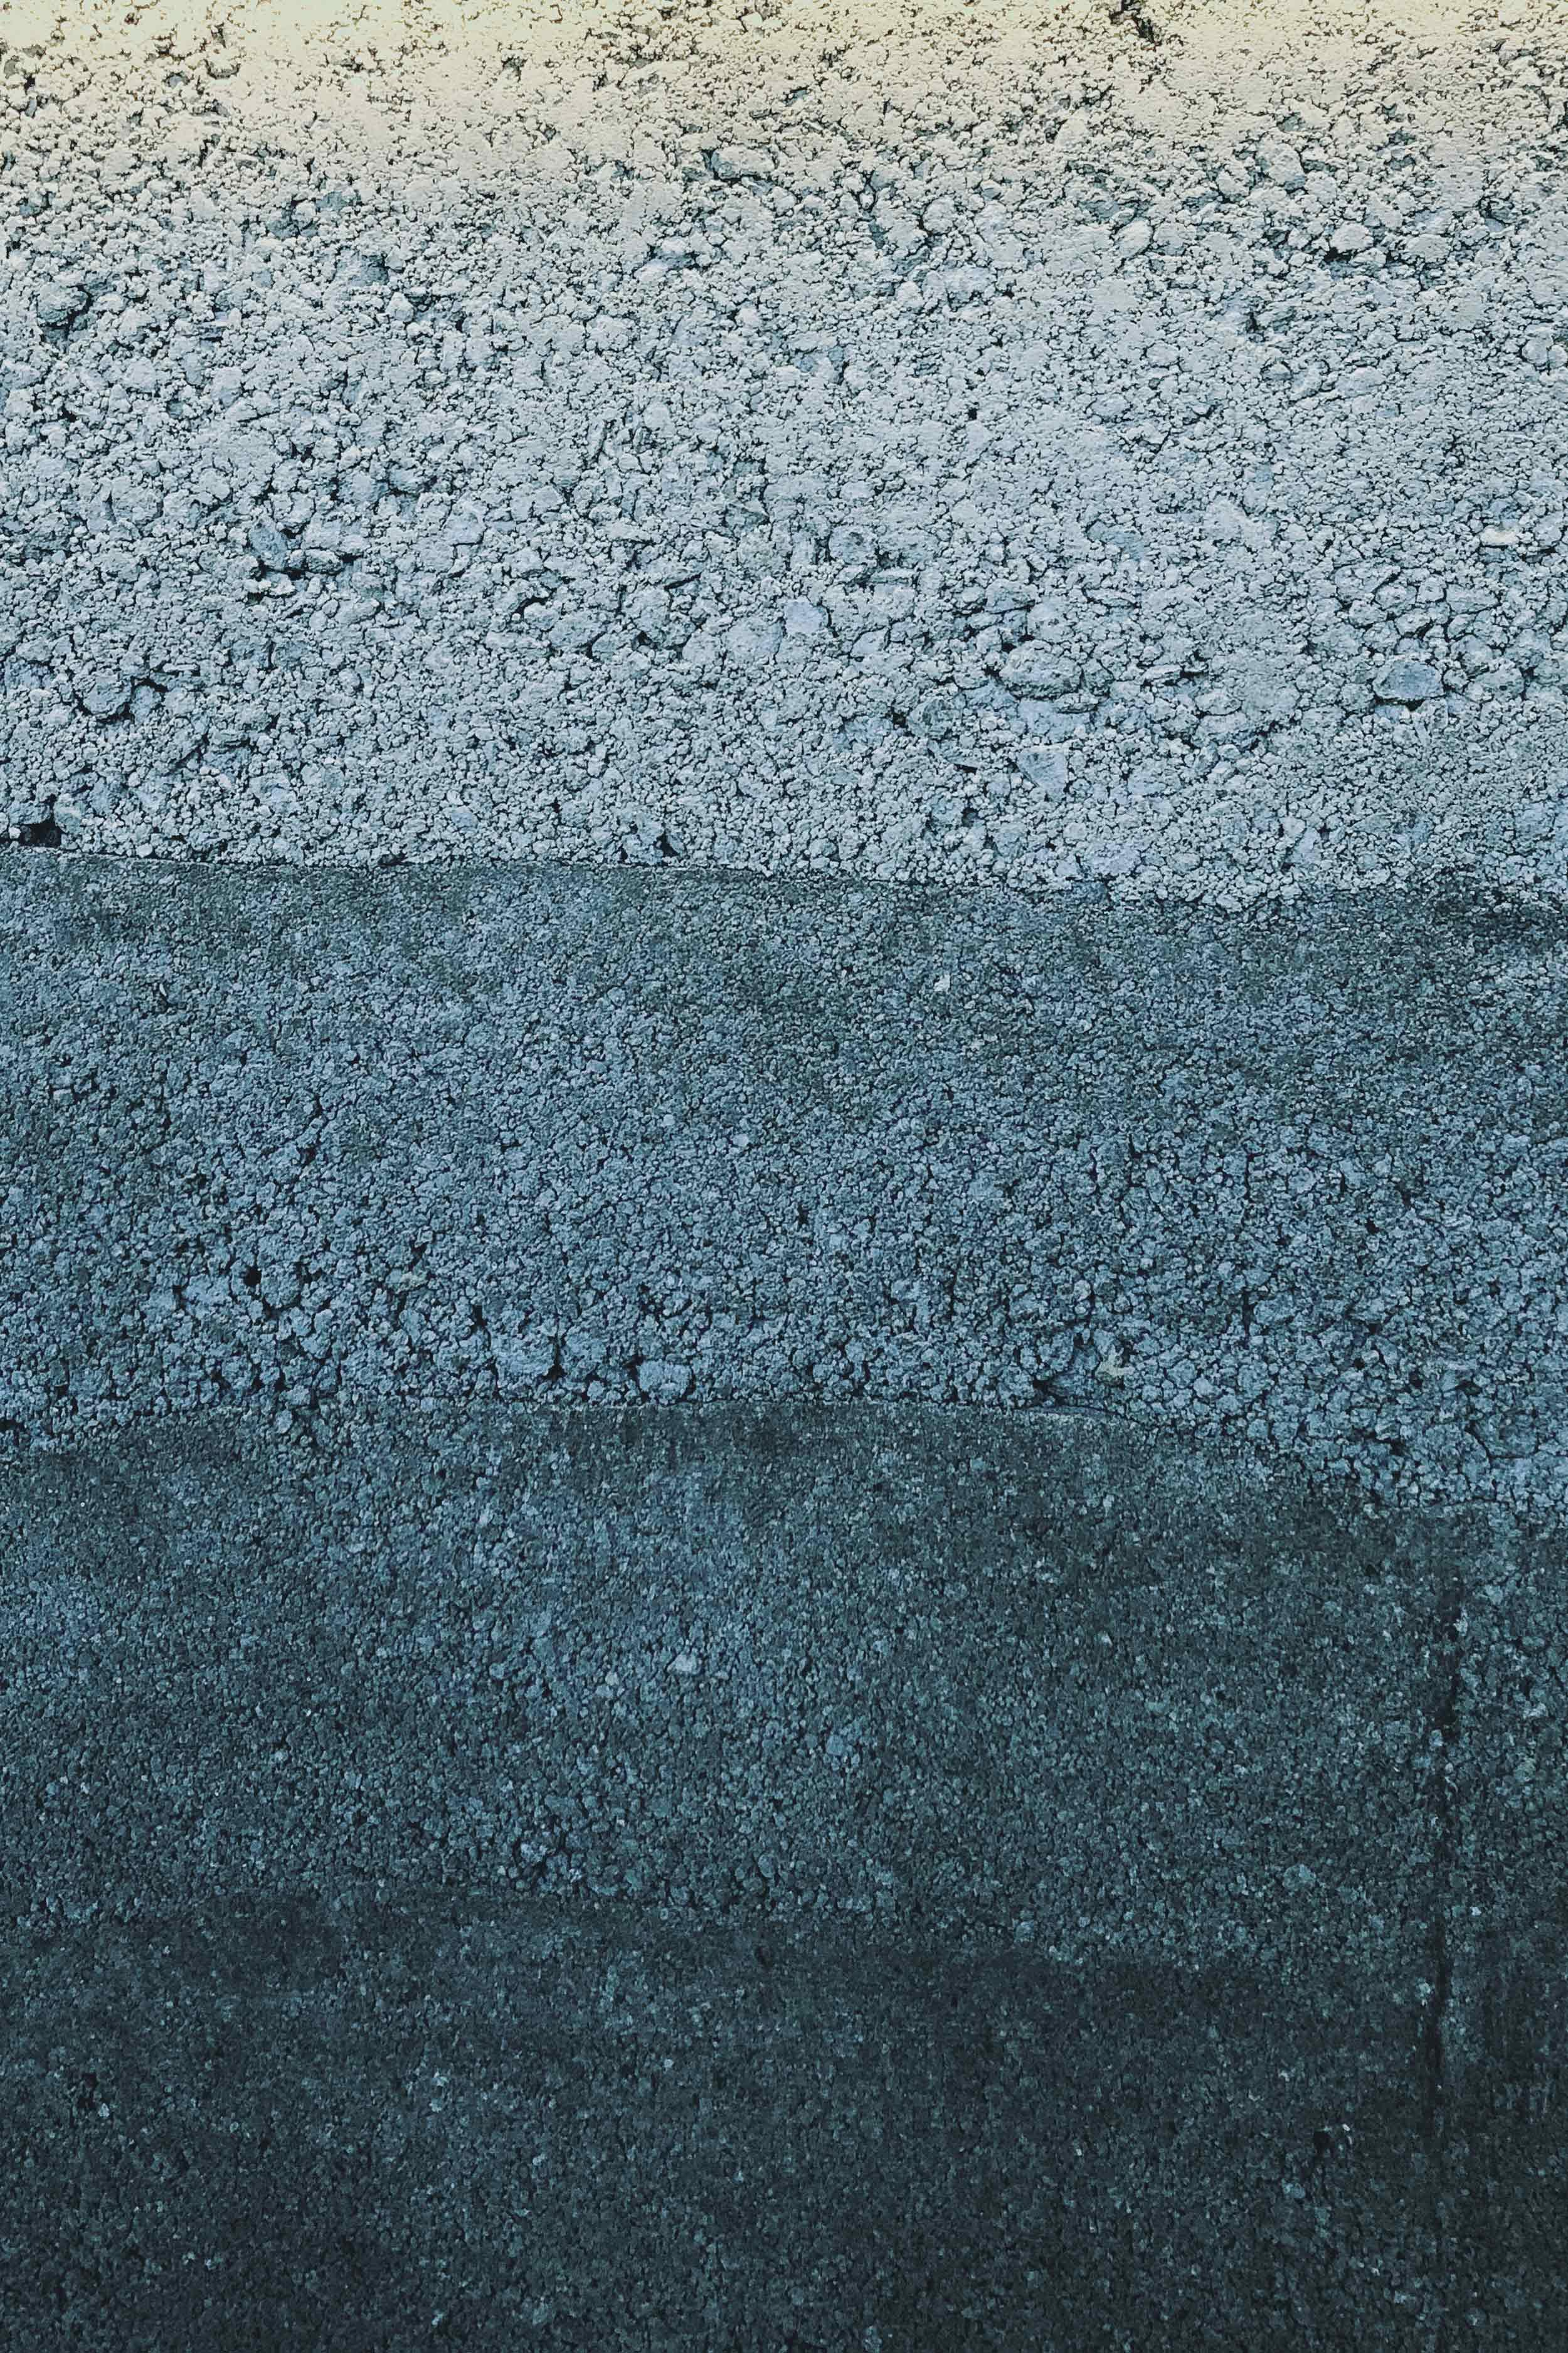 atomic-concrete.jpg